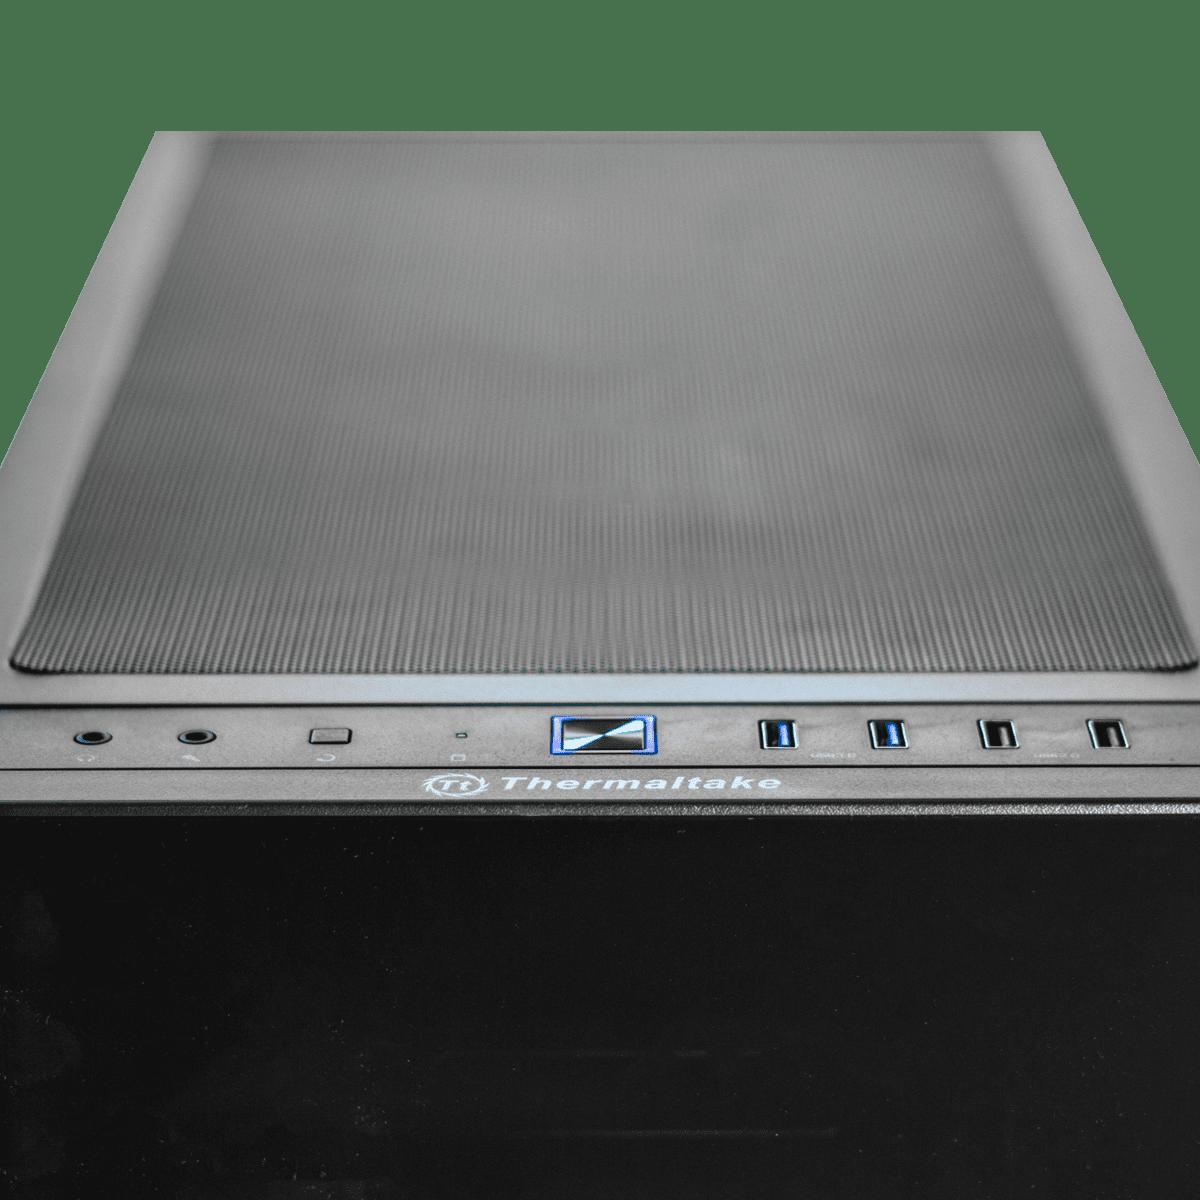 Intel Z390 Core i7 RTX 2070